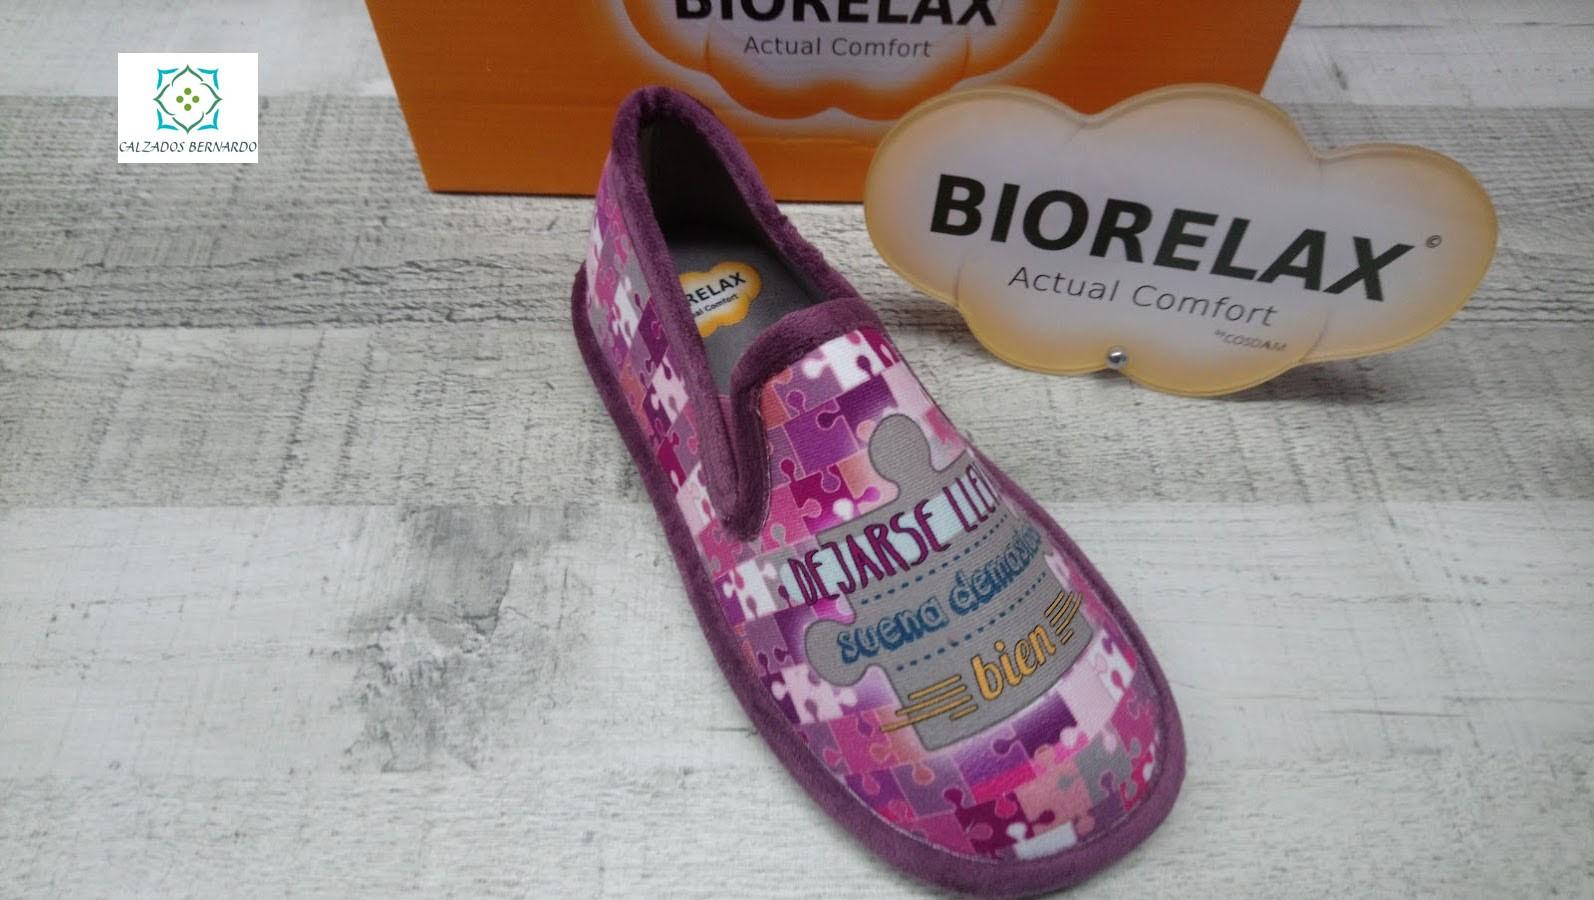 biorelax grenobla malva